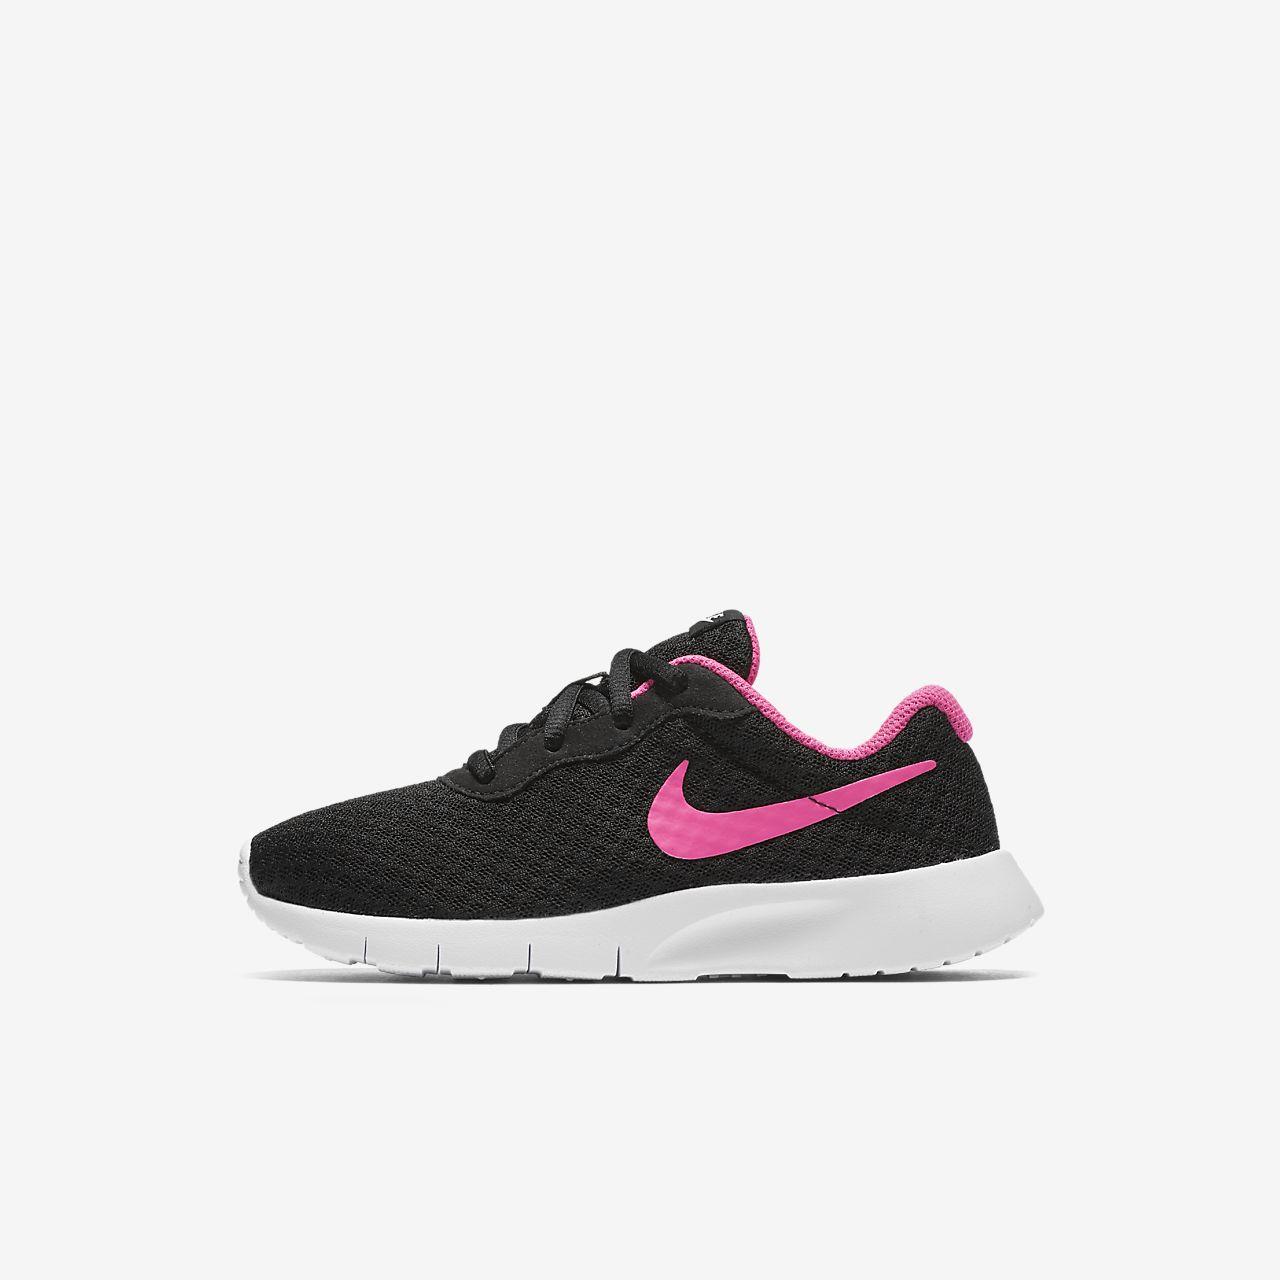 size 40 77b89 75293 ... Chaussure Nike Tanjun pour Jeune enfant